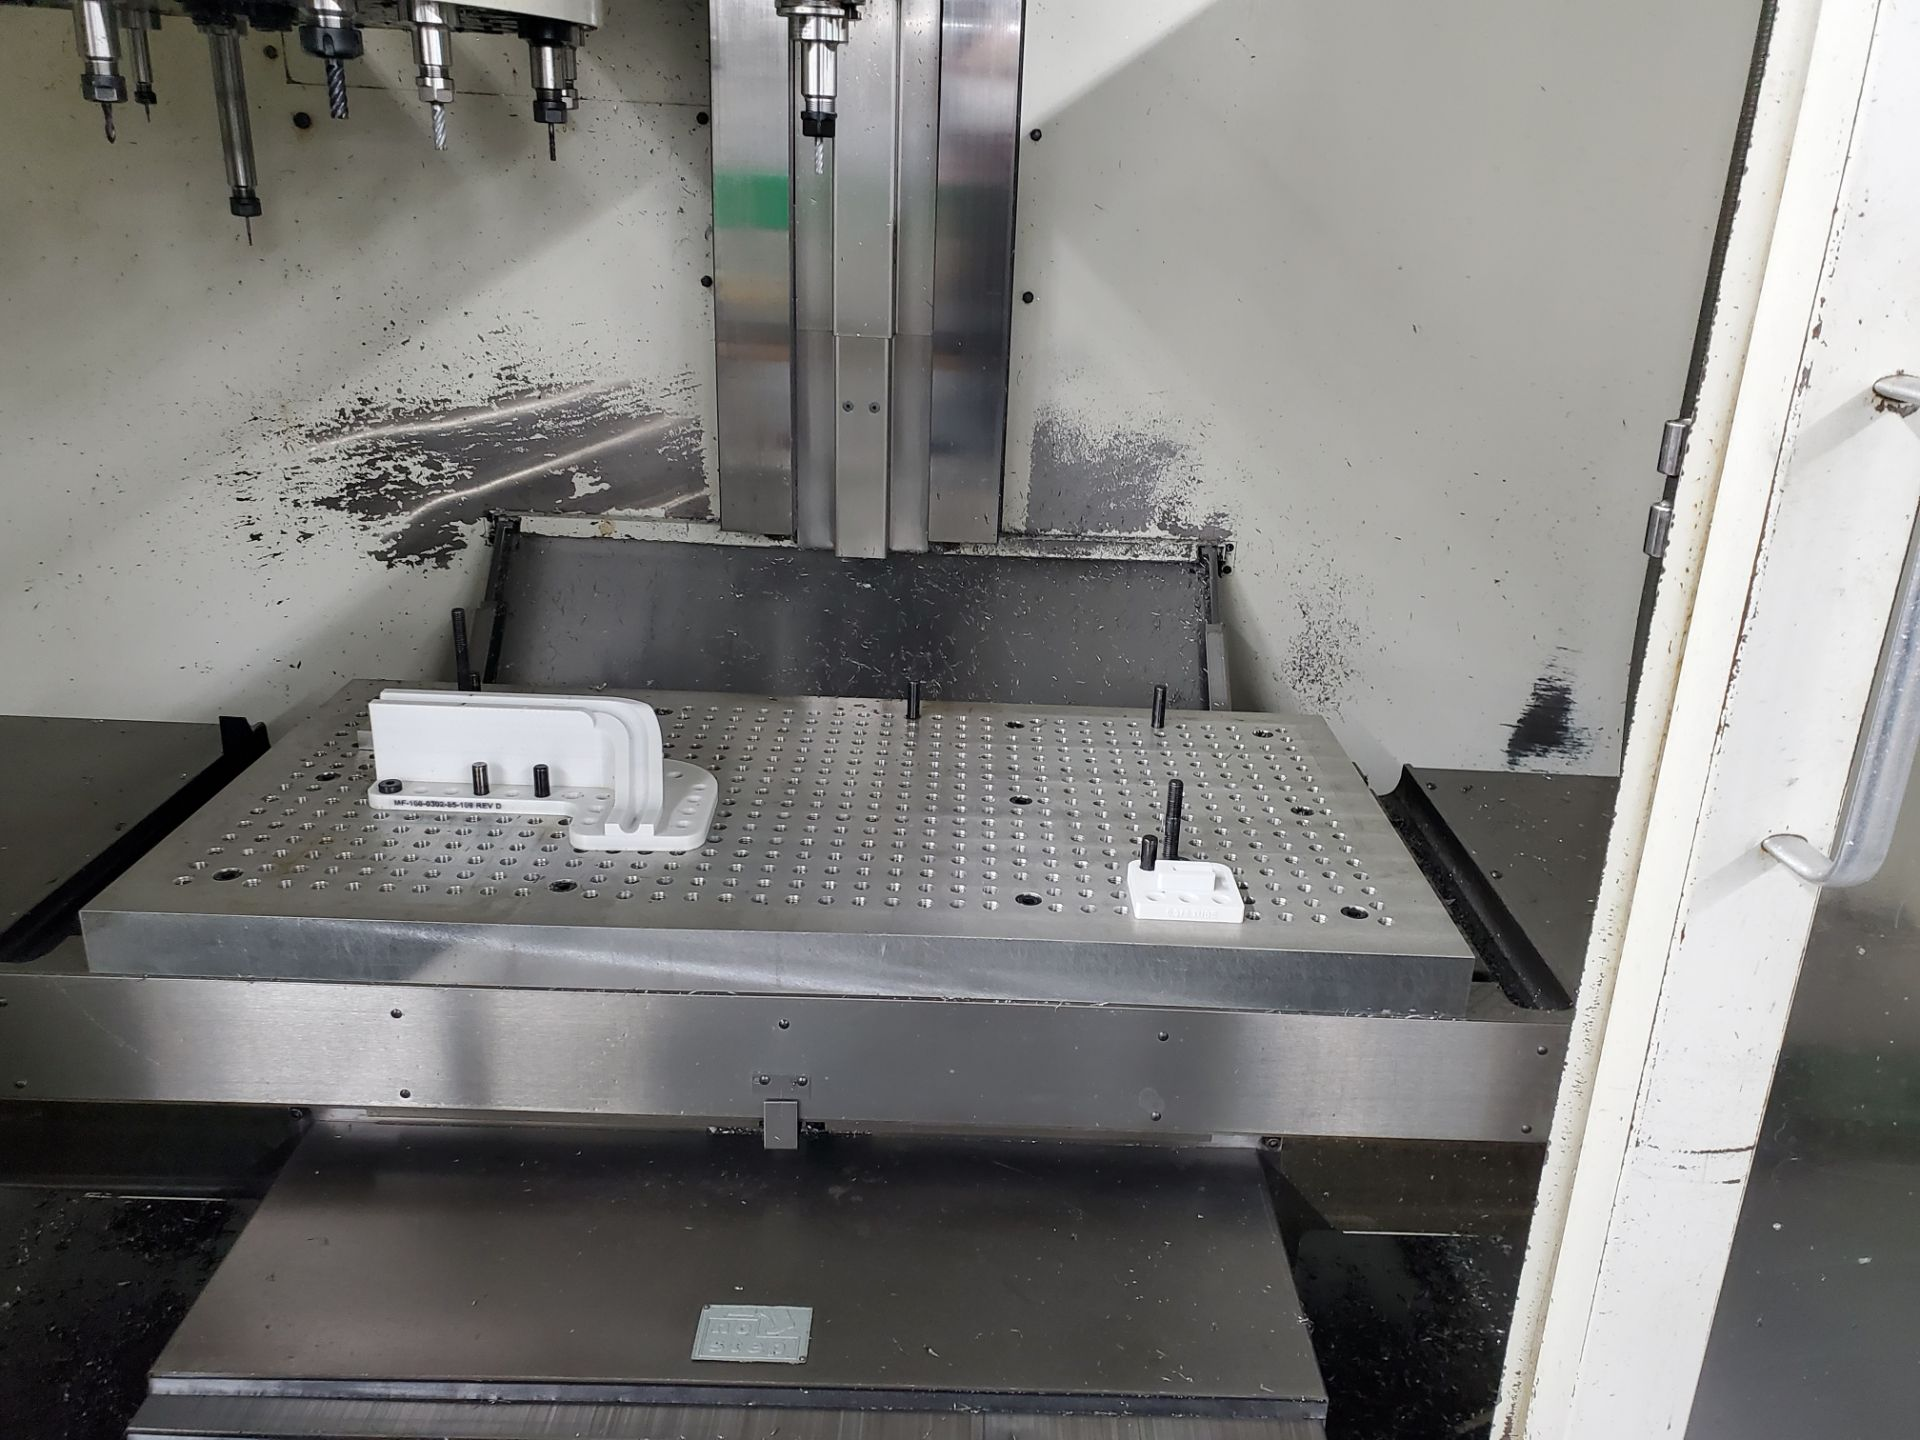 Fadal CNC Vertical Machining Center Model 4020 - Image 13 of 18